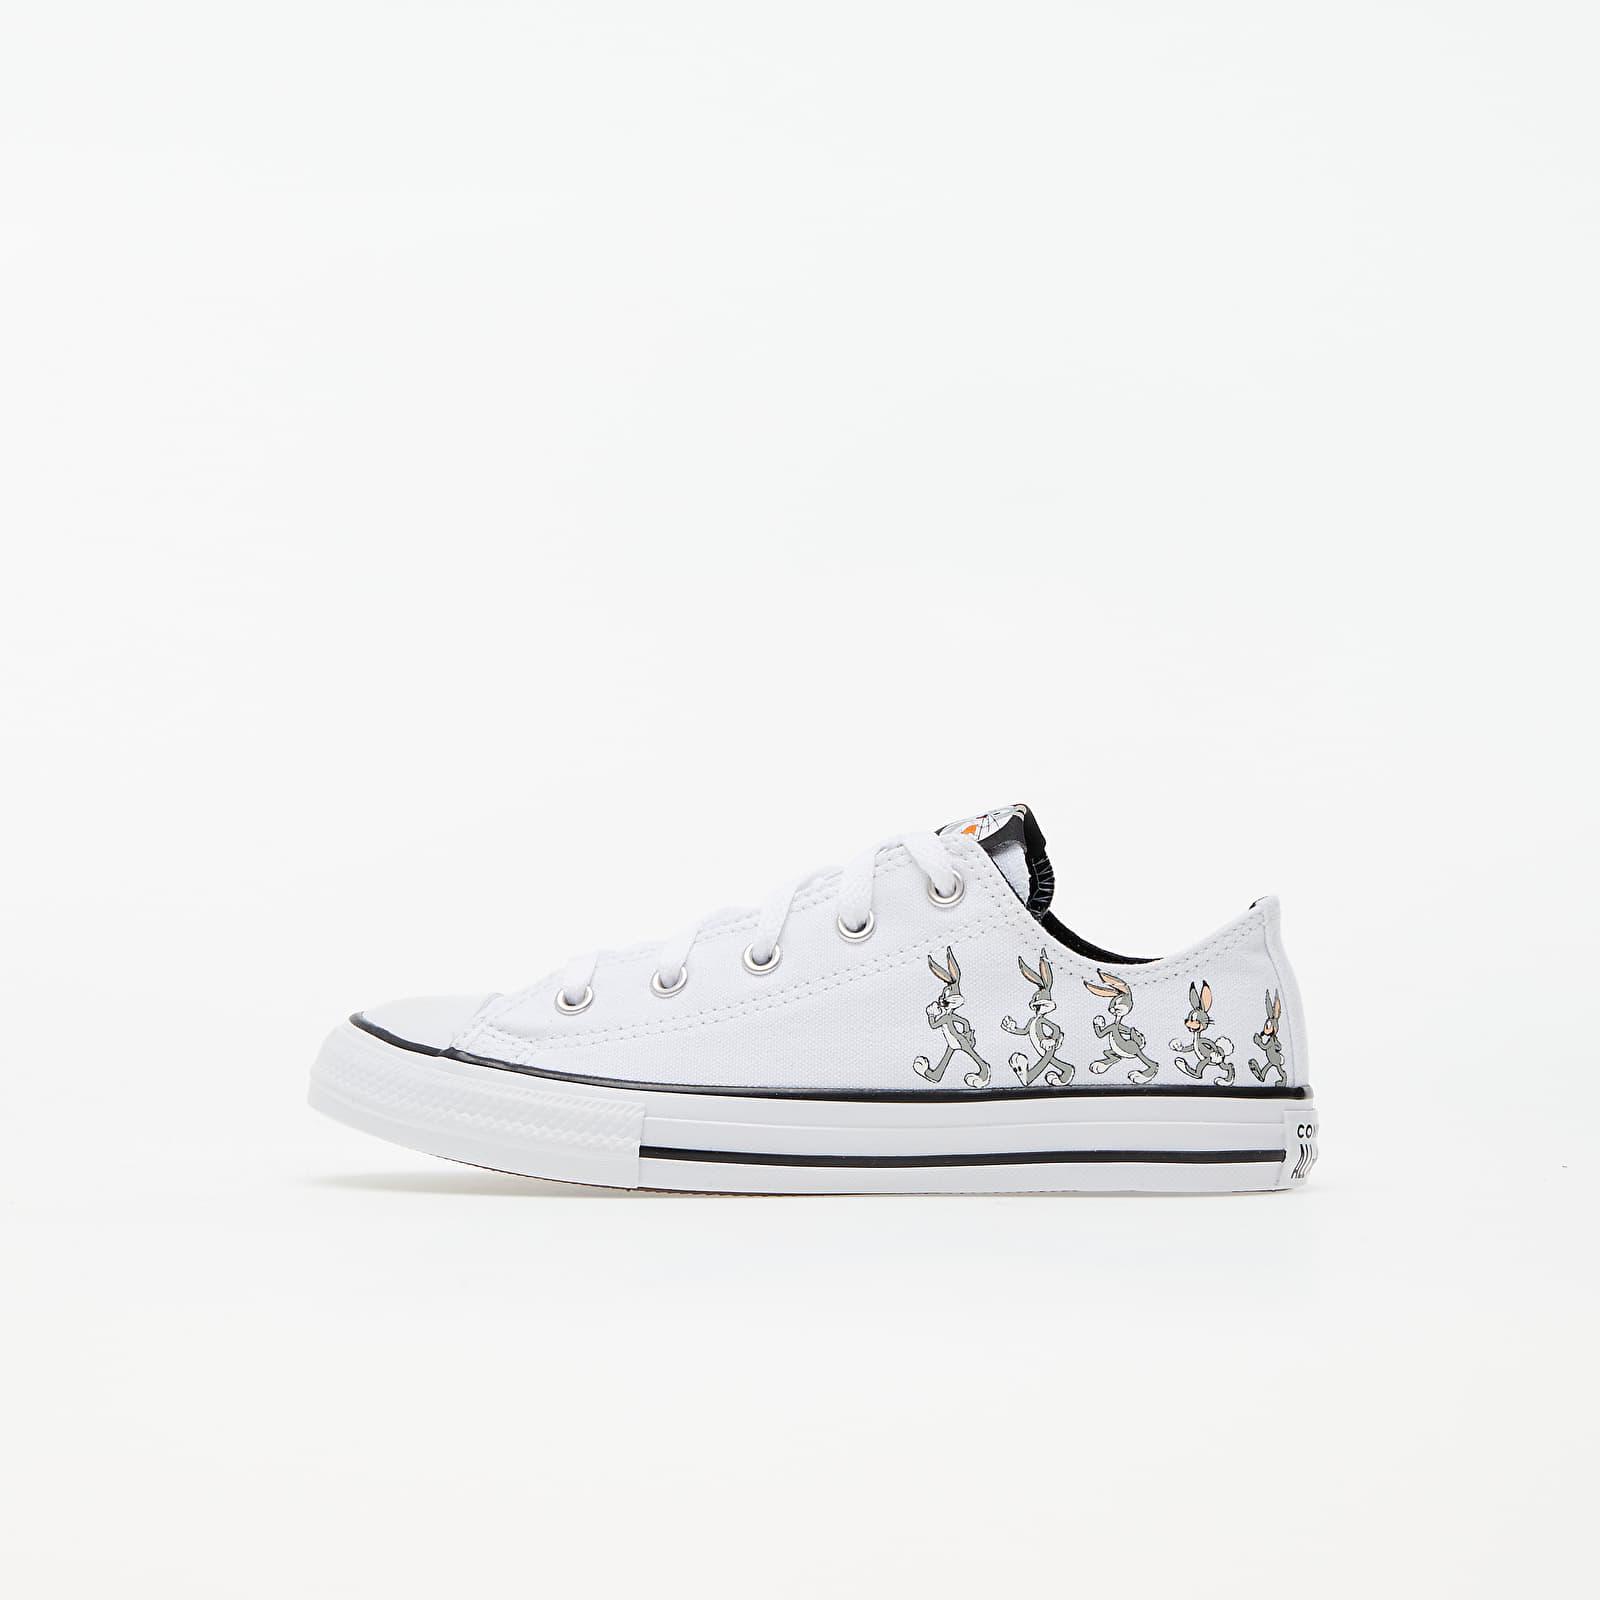 Converse x Bugs Bunny Chuck Taylor All Star OX Grey/ White EUR 32